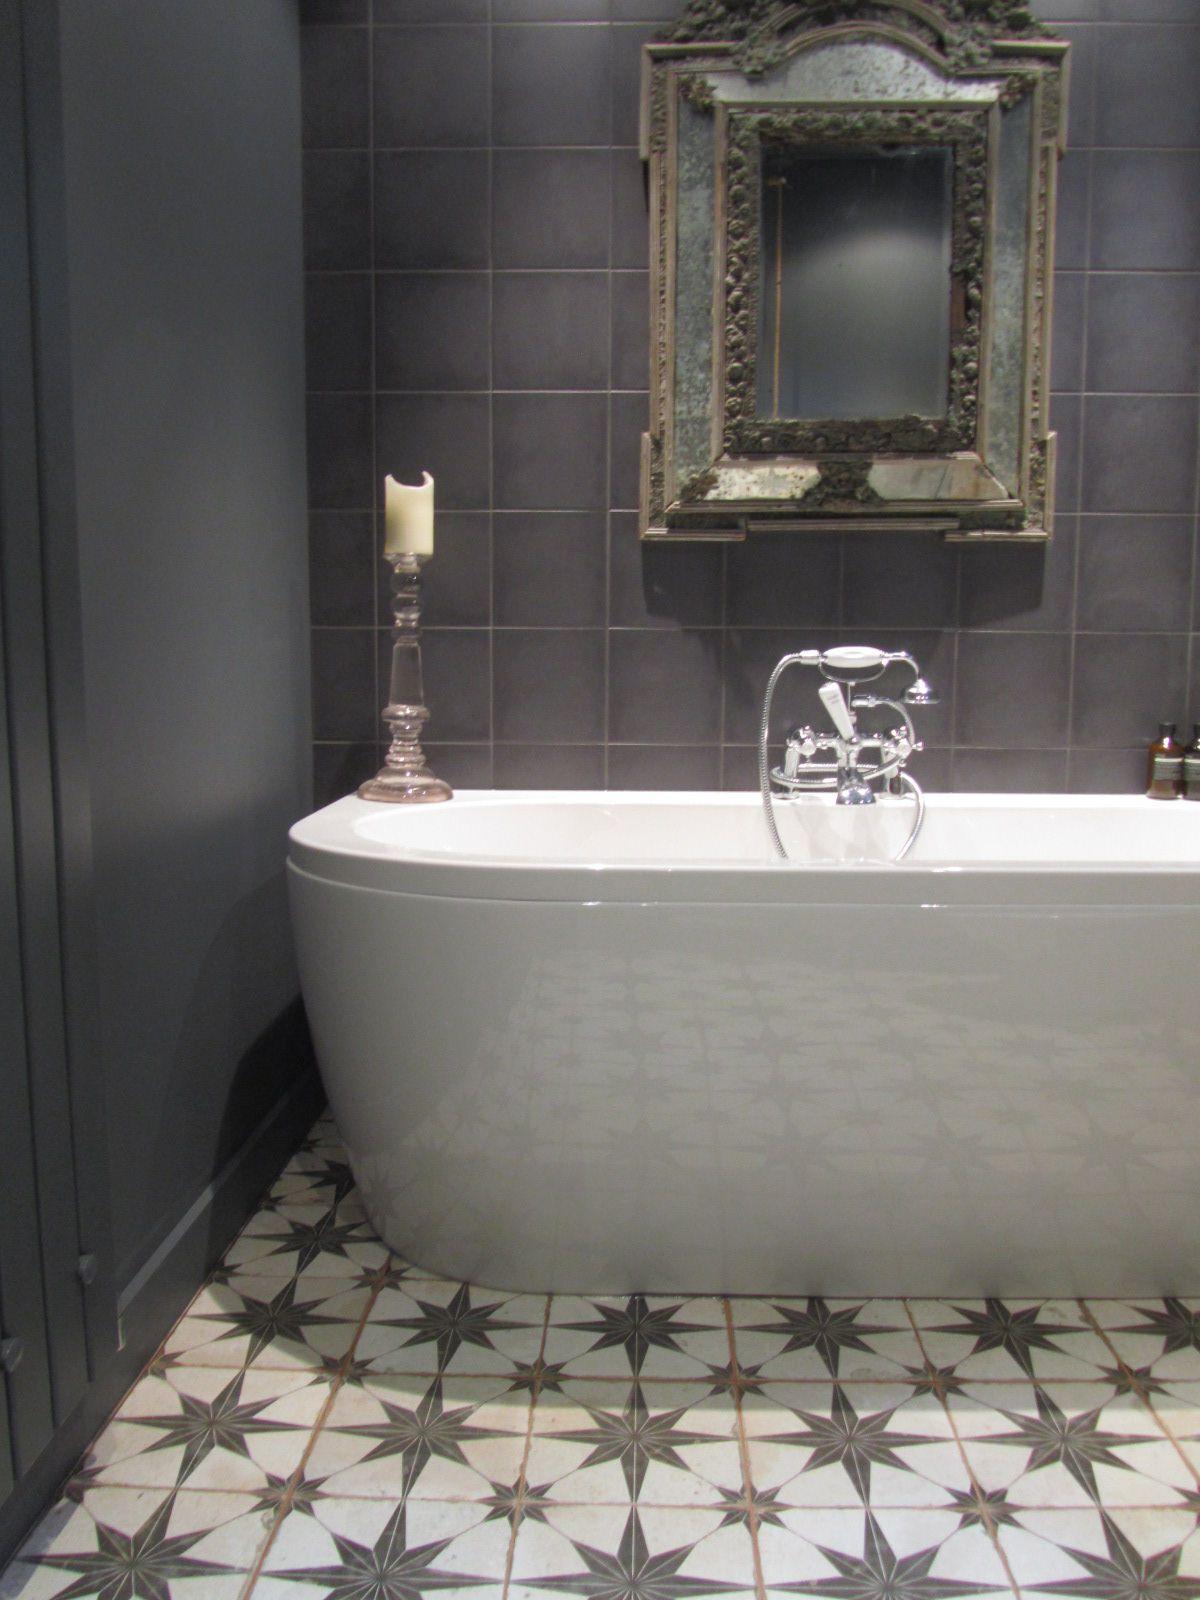 Pin By Betsey Crosby Thompson On Bathe Bamboo Flooring Bathroom Yellow Bathroom Tiles Bathroom Tile Designs